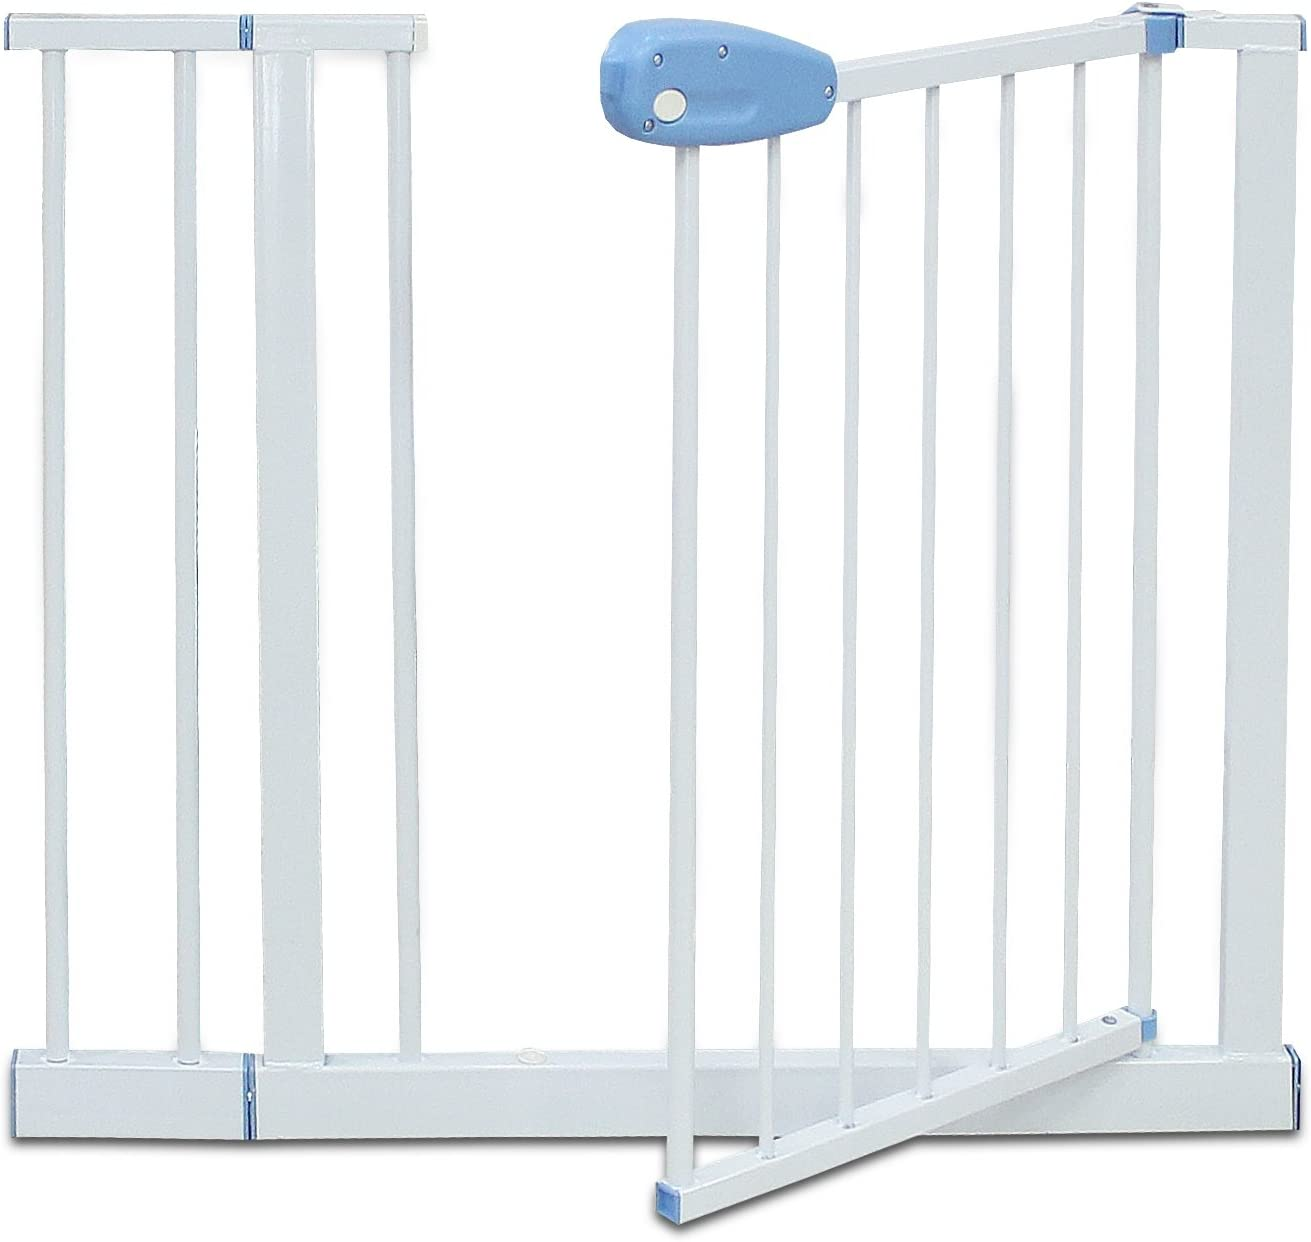 Blanco extensi/ón a 88-101 cm Barrera de Seguridad para Puerta Ajustable Alto: 74 cm Ancho: 74-87 cm Sotech Barrera de Seguridad para Beb/és